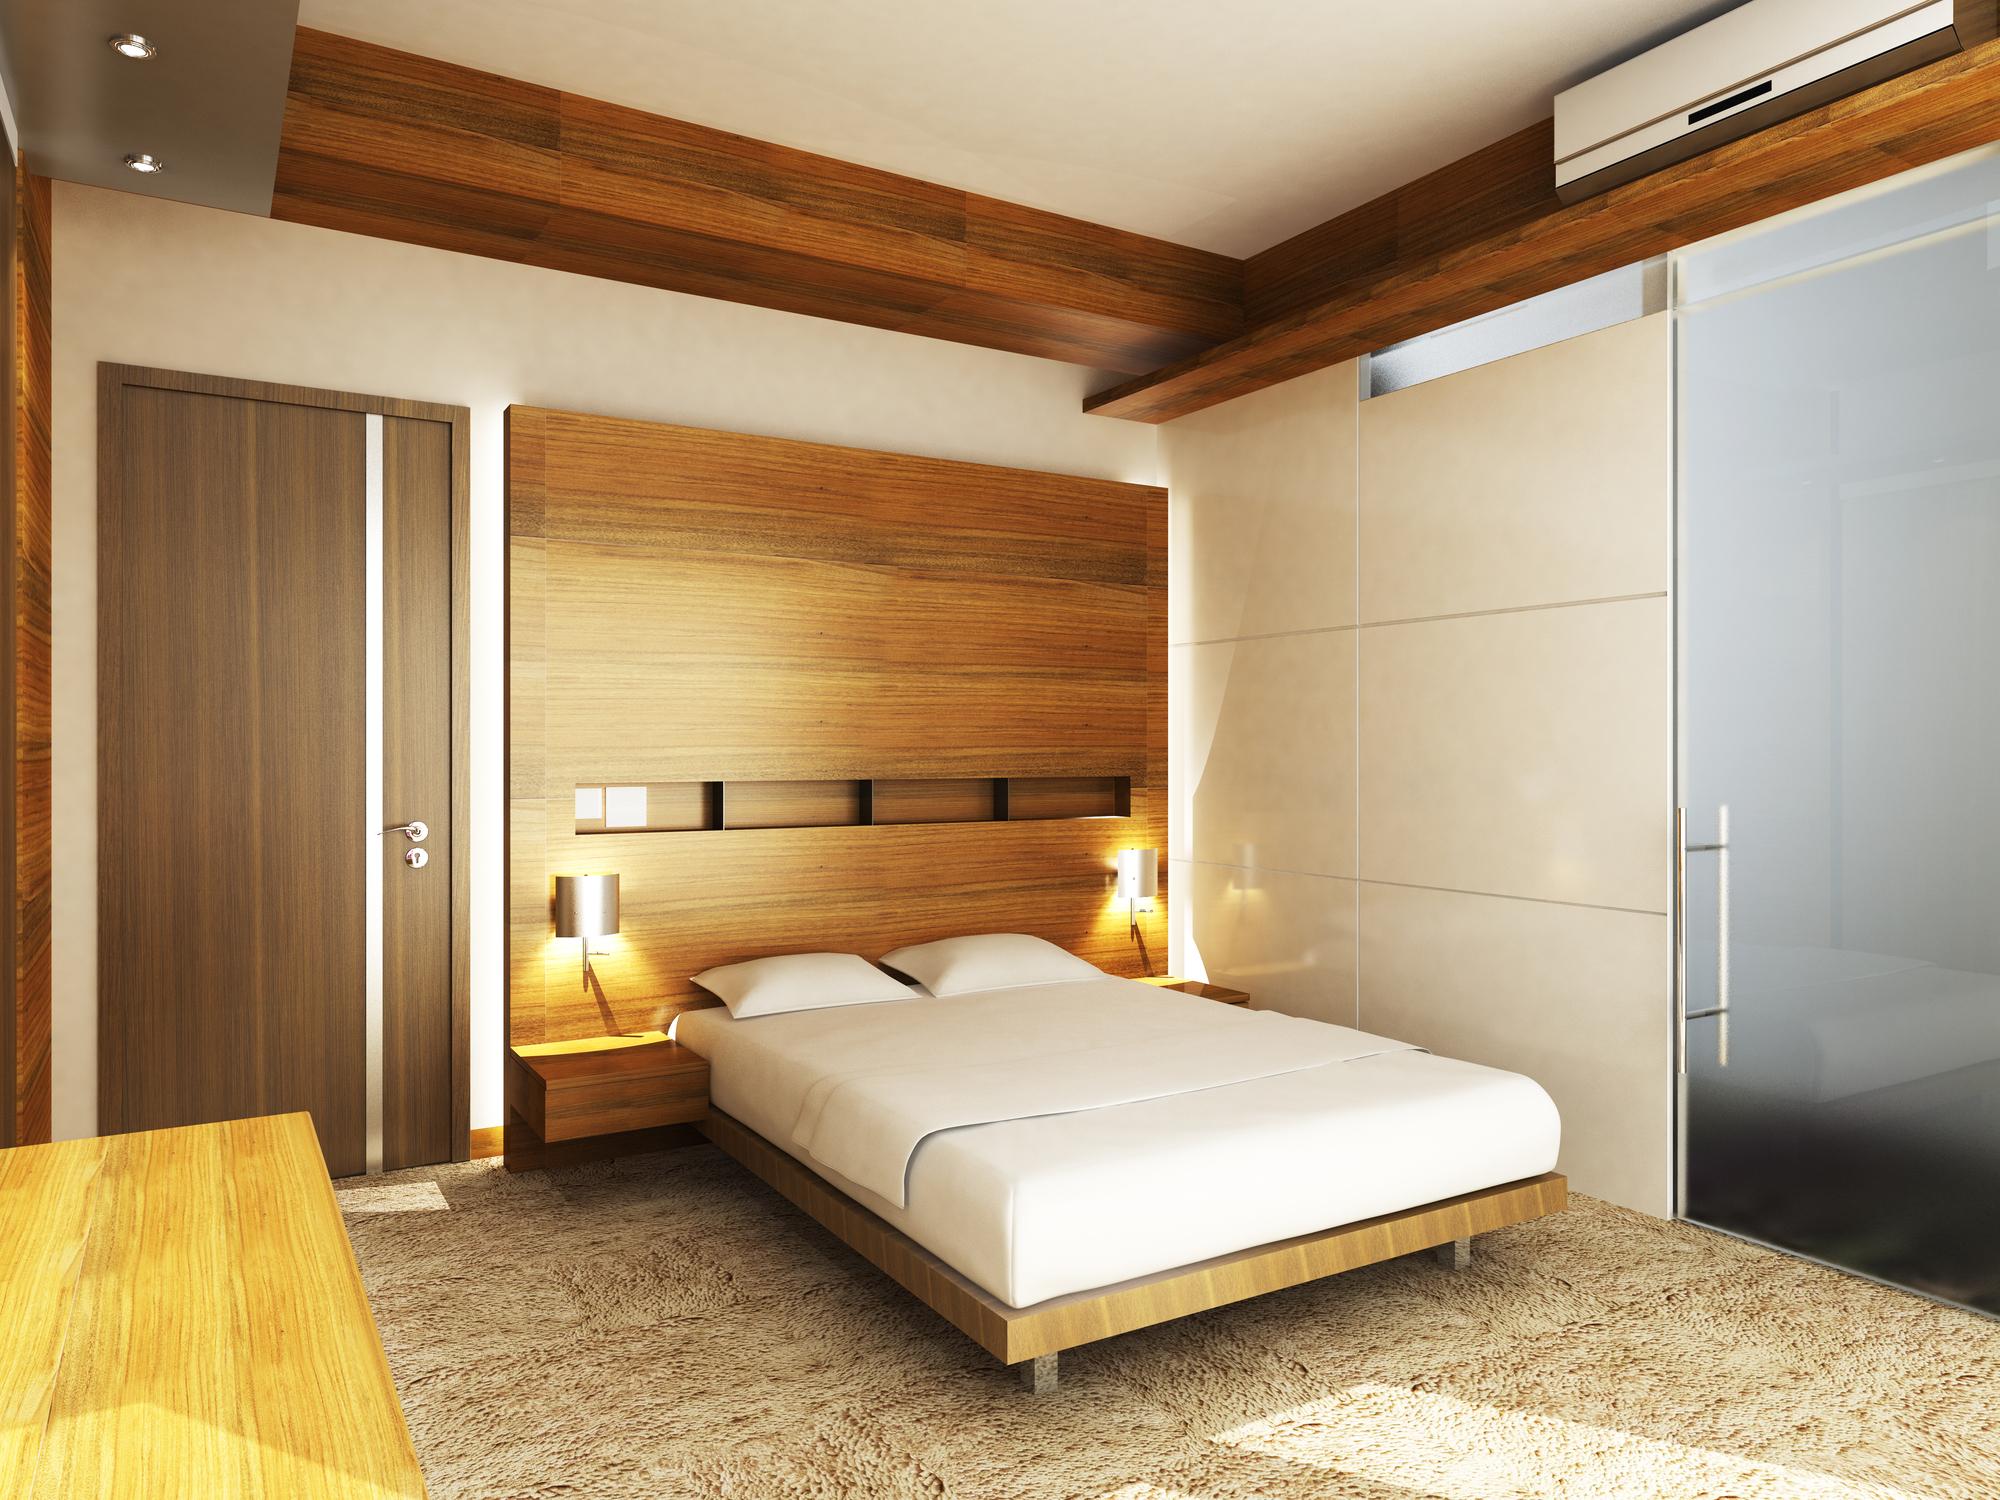 lighting-decor